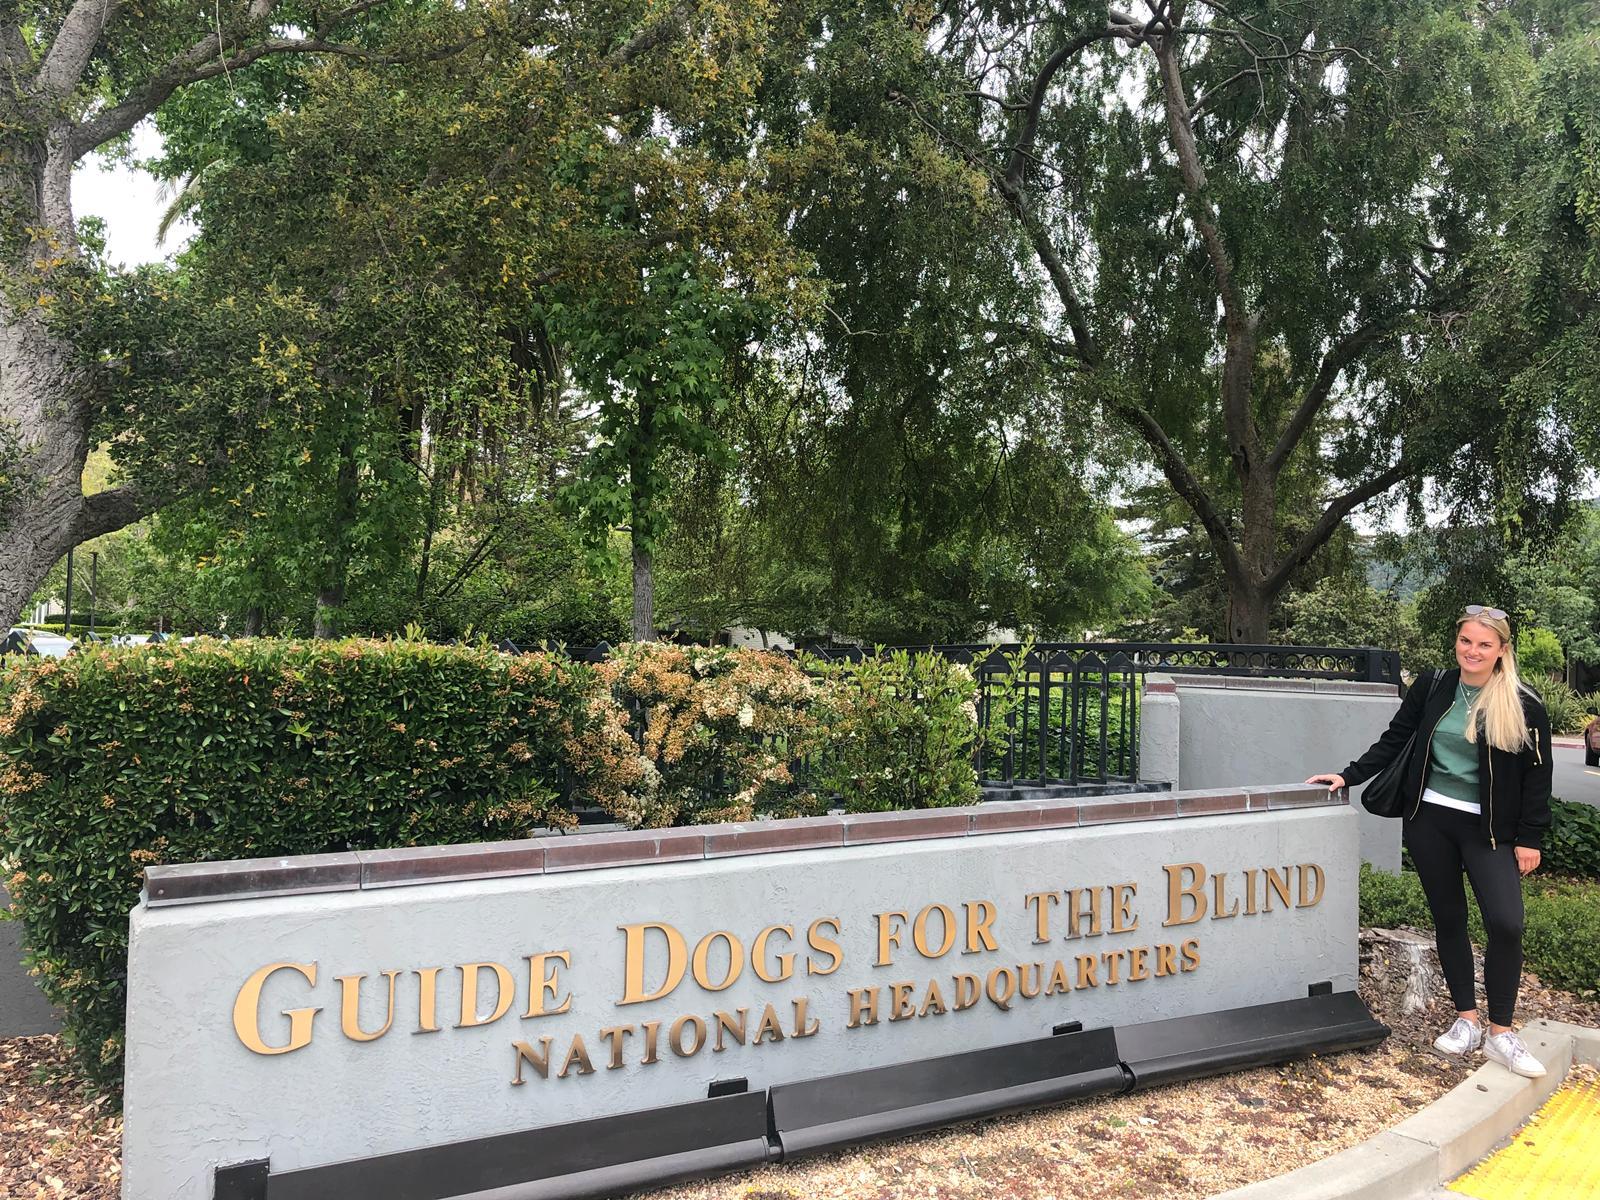 Teresa Seitle steht rechts neben dem Schild: Guide Dogs for the blind